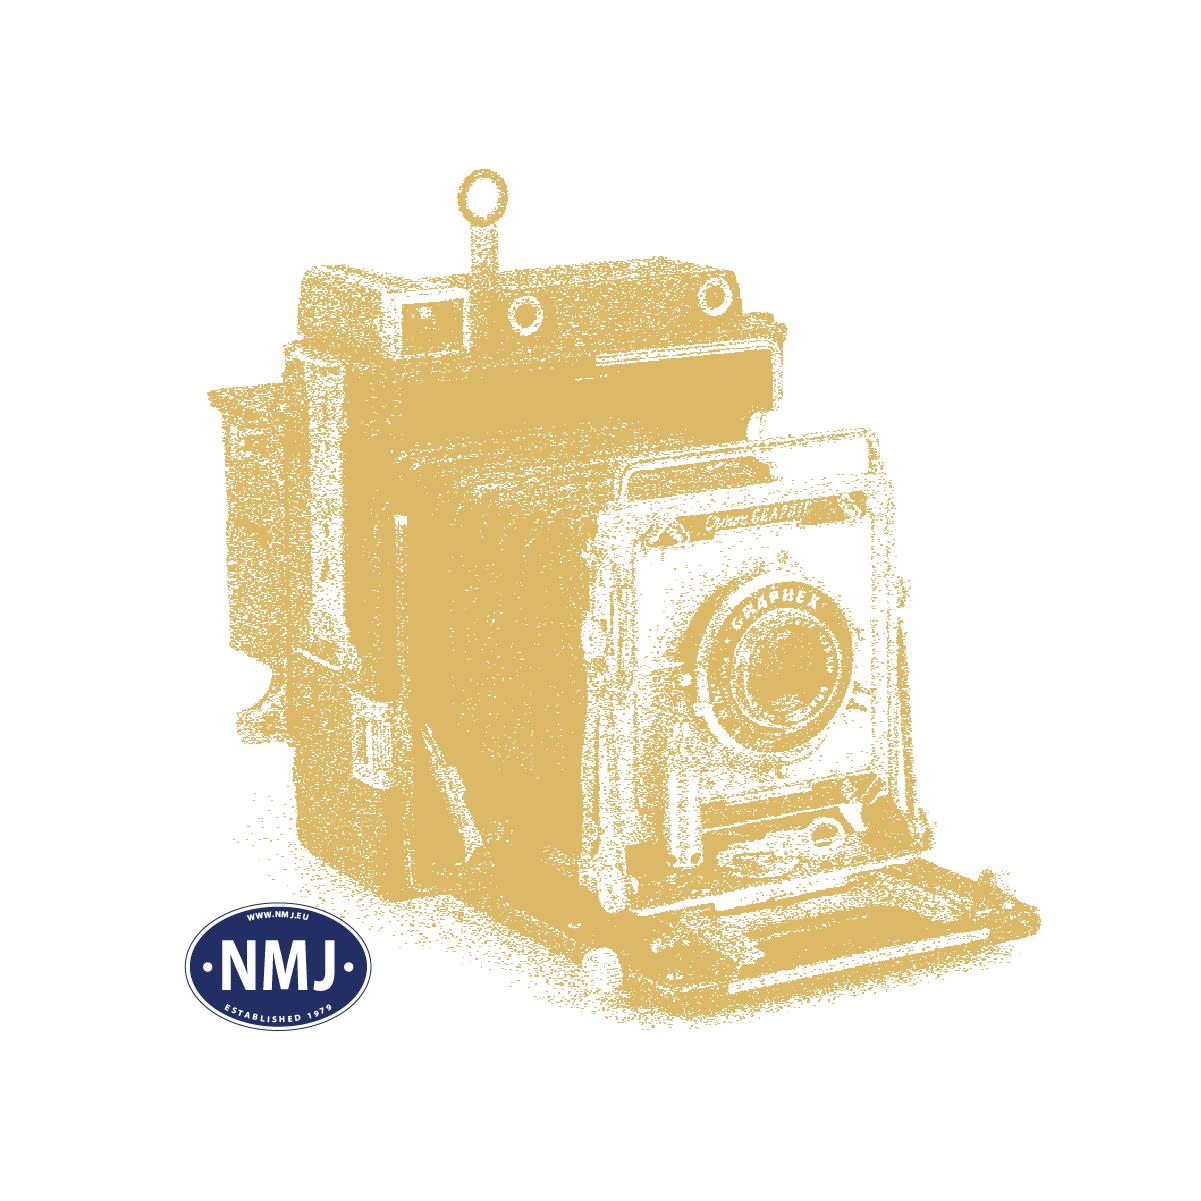 MBR55-1016 - Gressmatte #16, 30 x 40 Cm